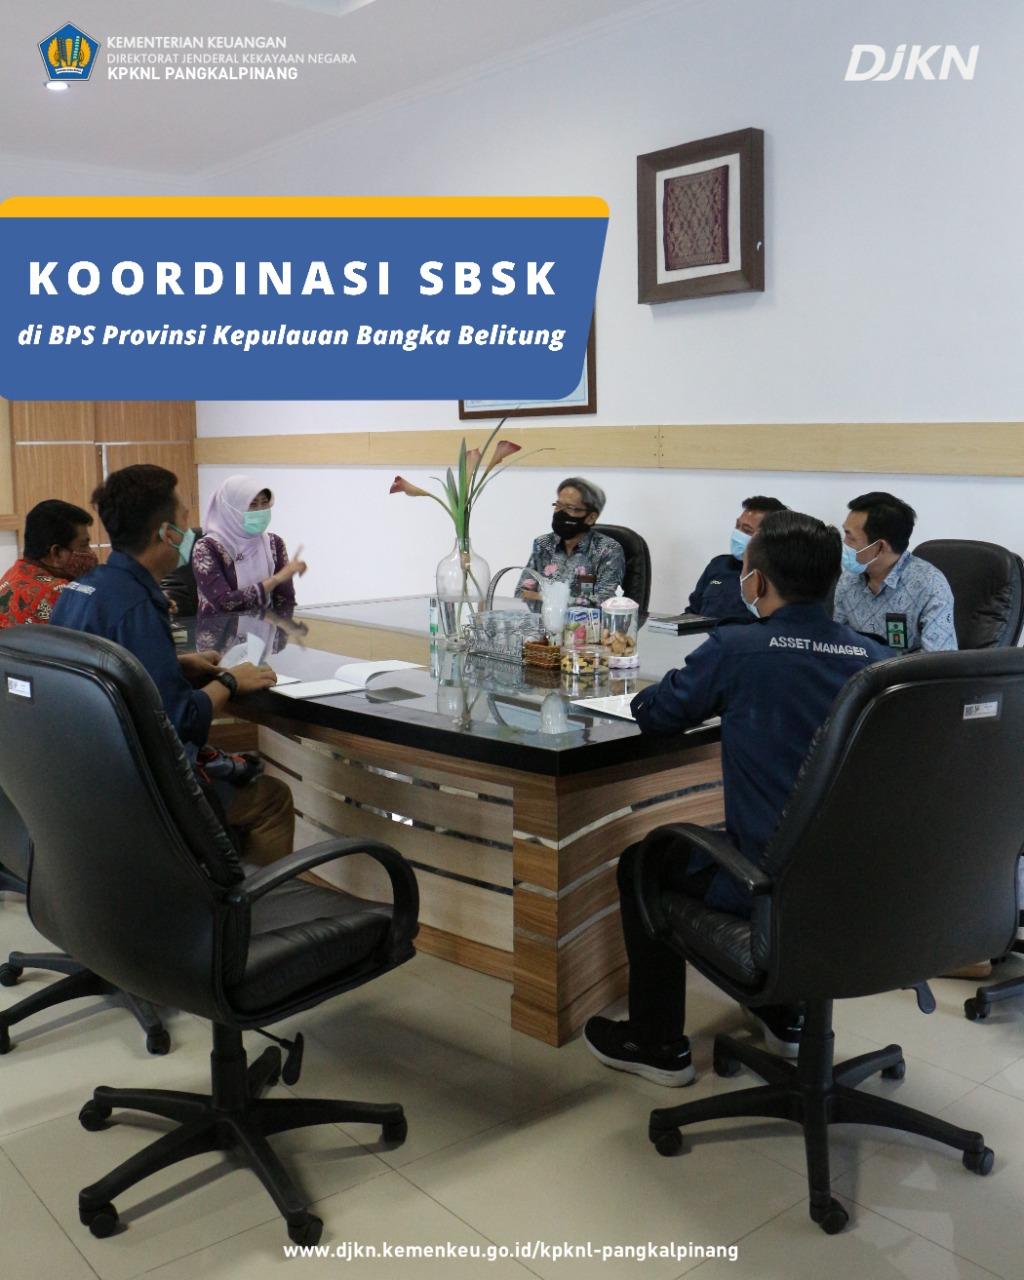 Sambung Silaturahmi dan Perkuat Sinergi, Kakanwil DJKN SJB Beserta Jajarannya Lakukan Kunjungan Kerja